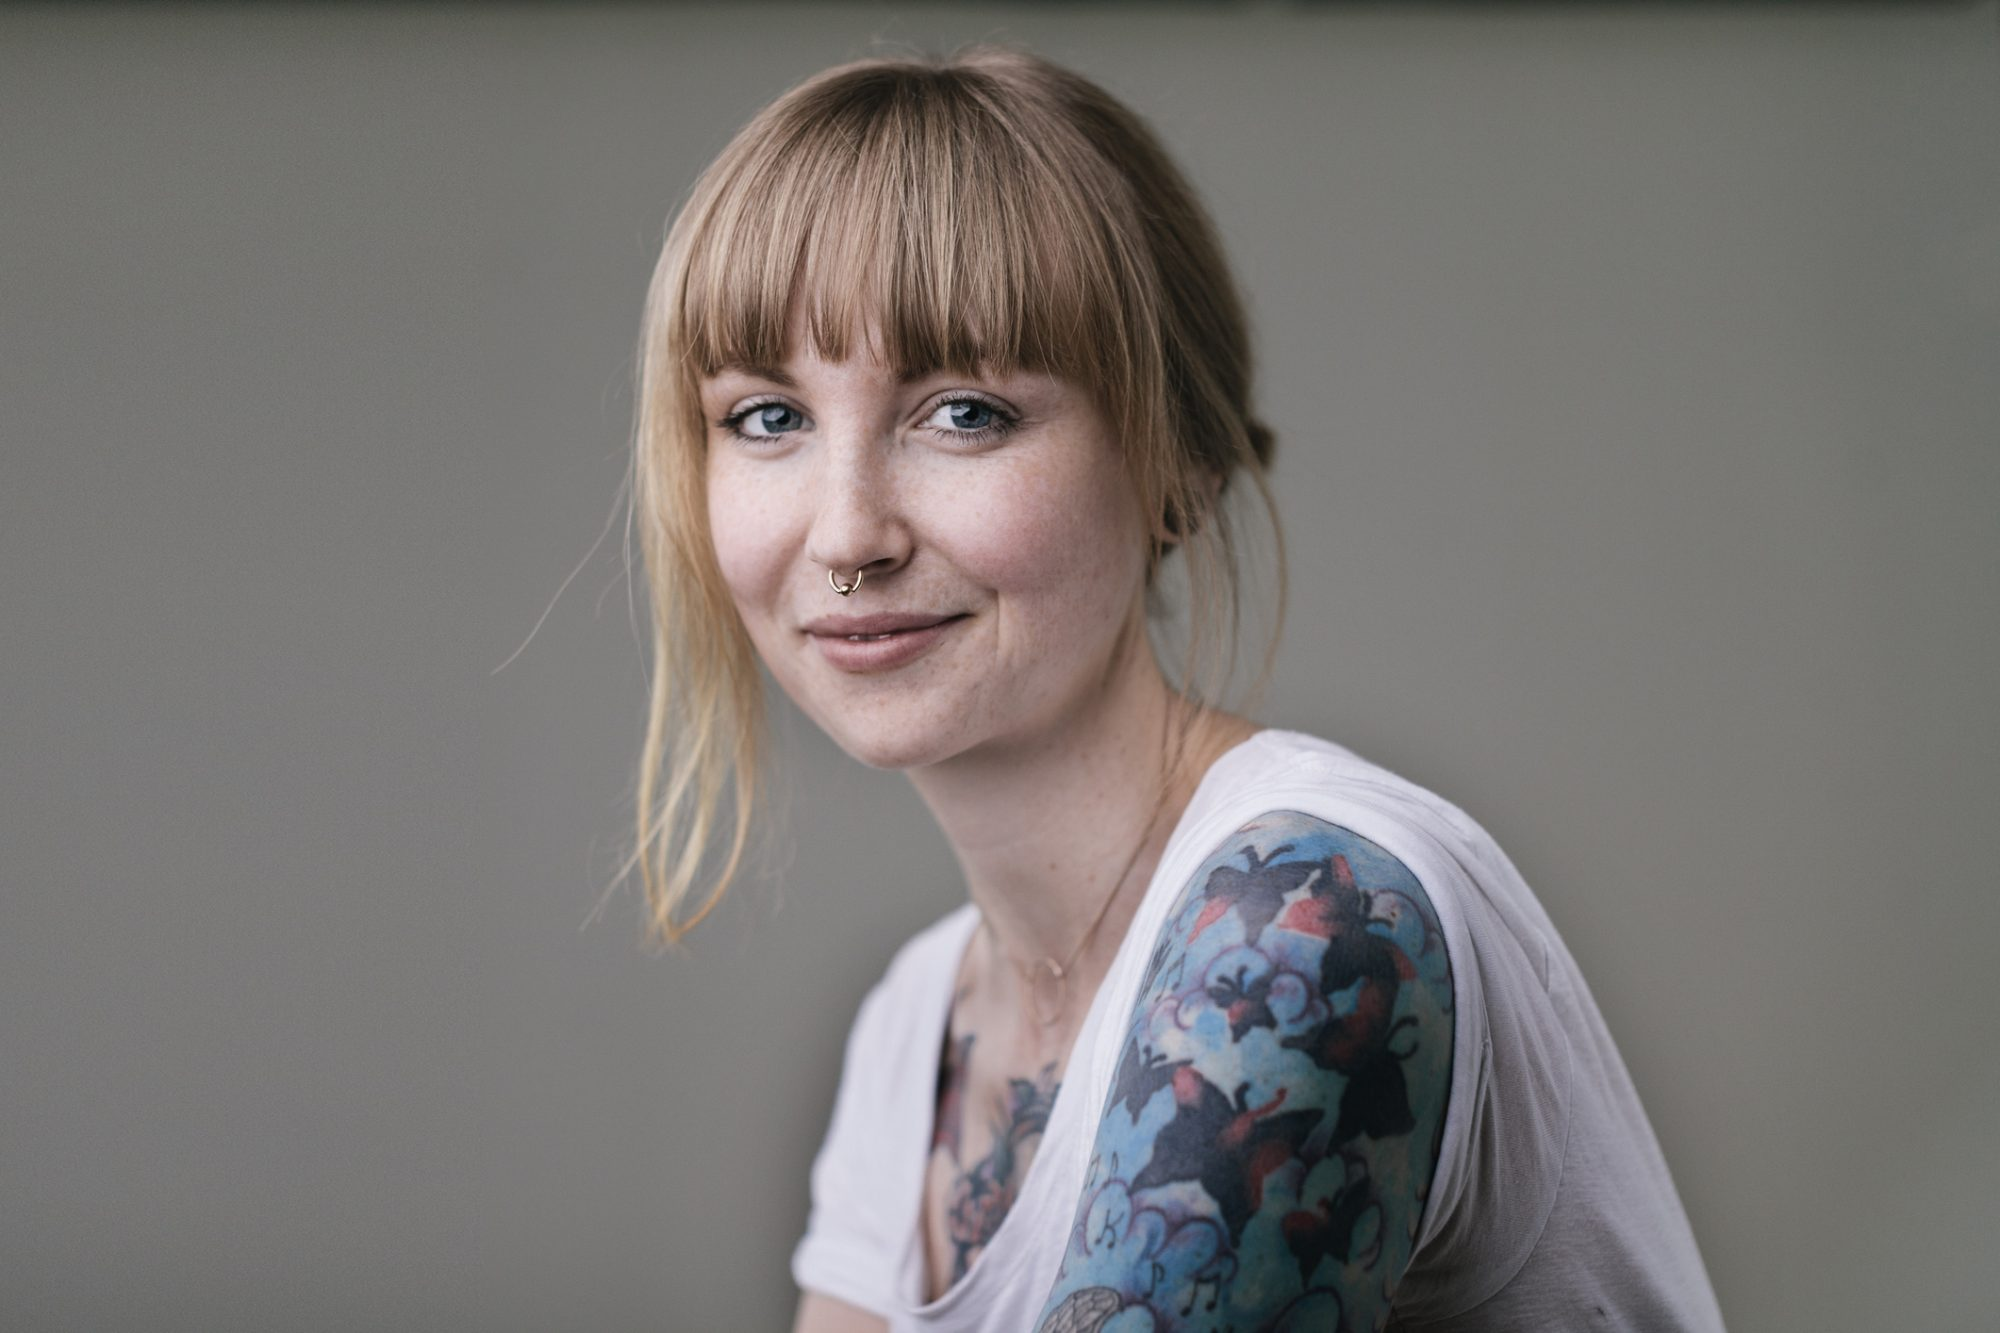 Tattooed Self-Confidence Woman